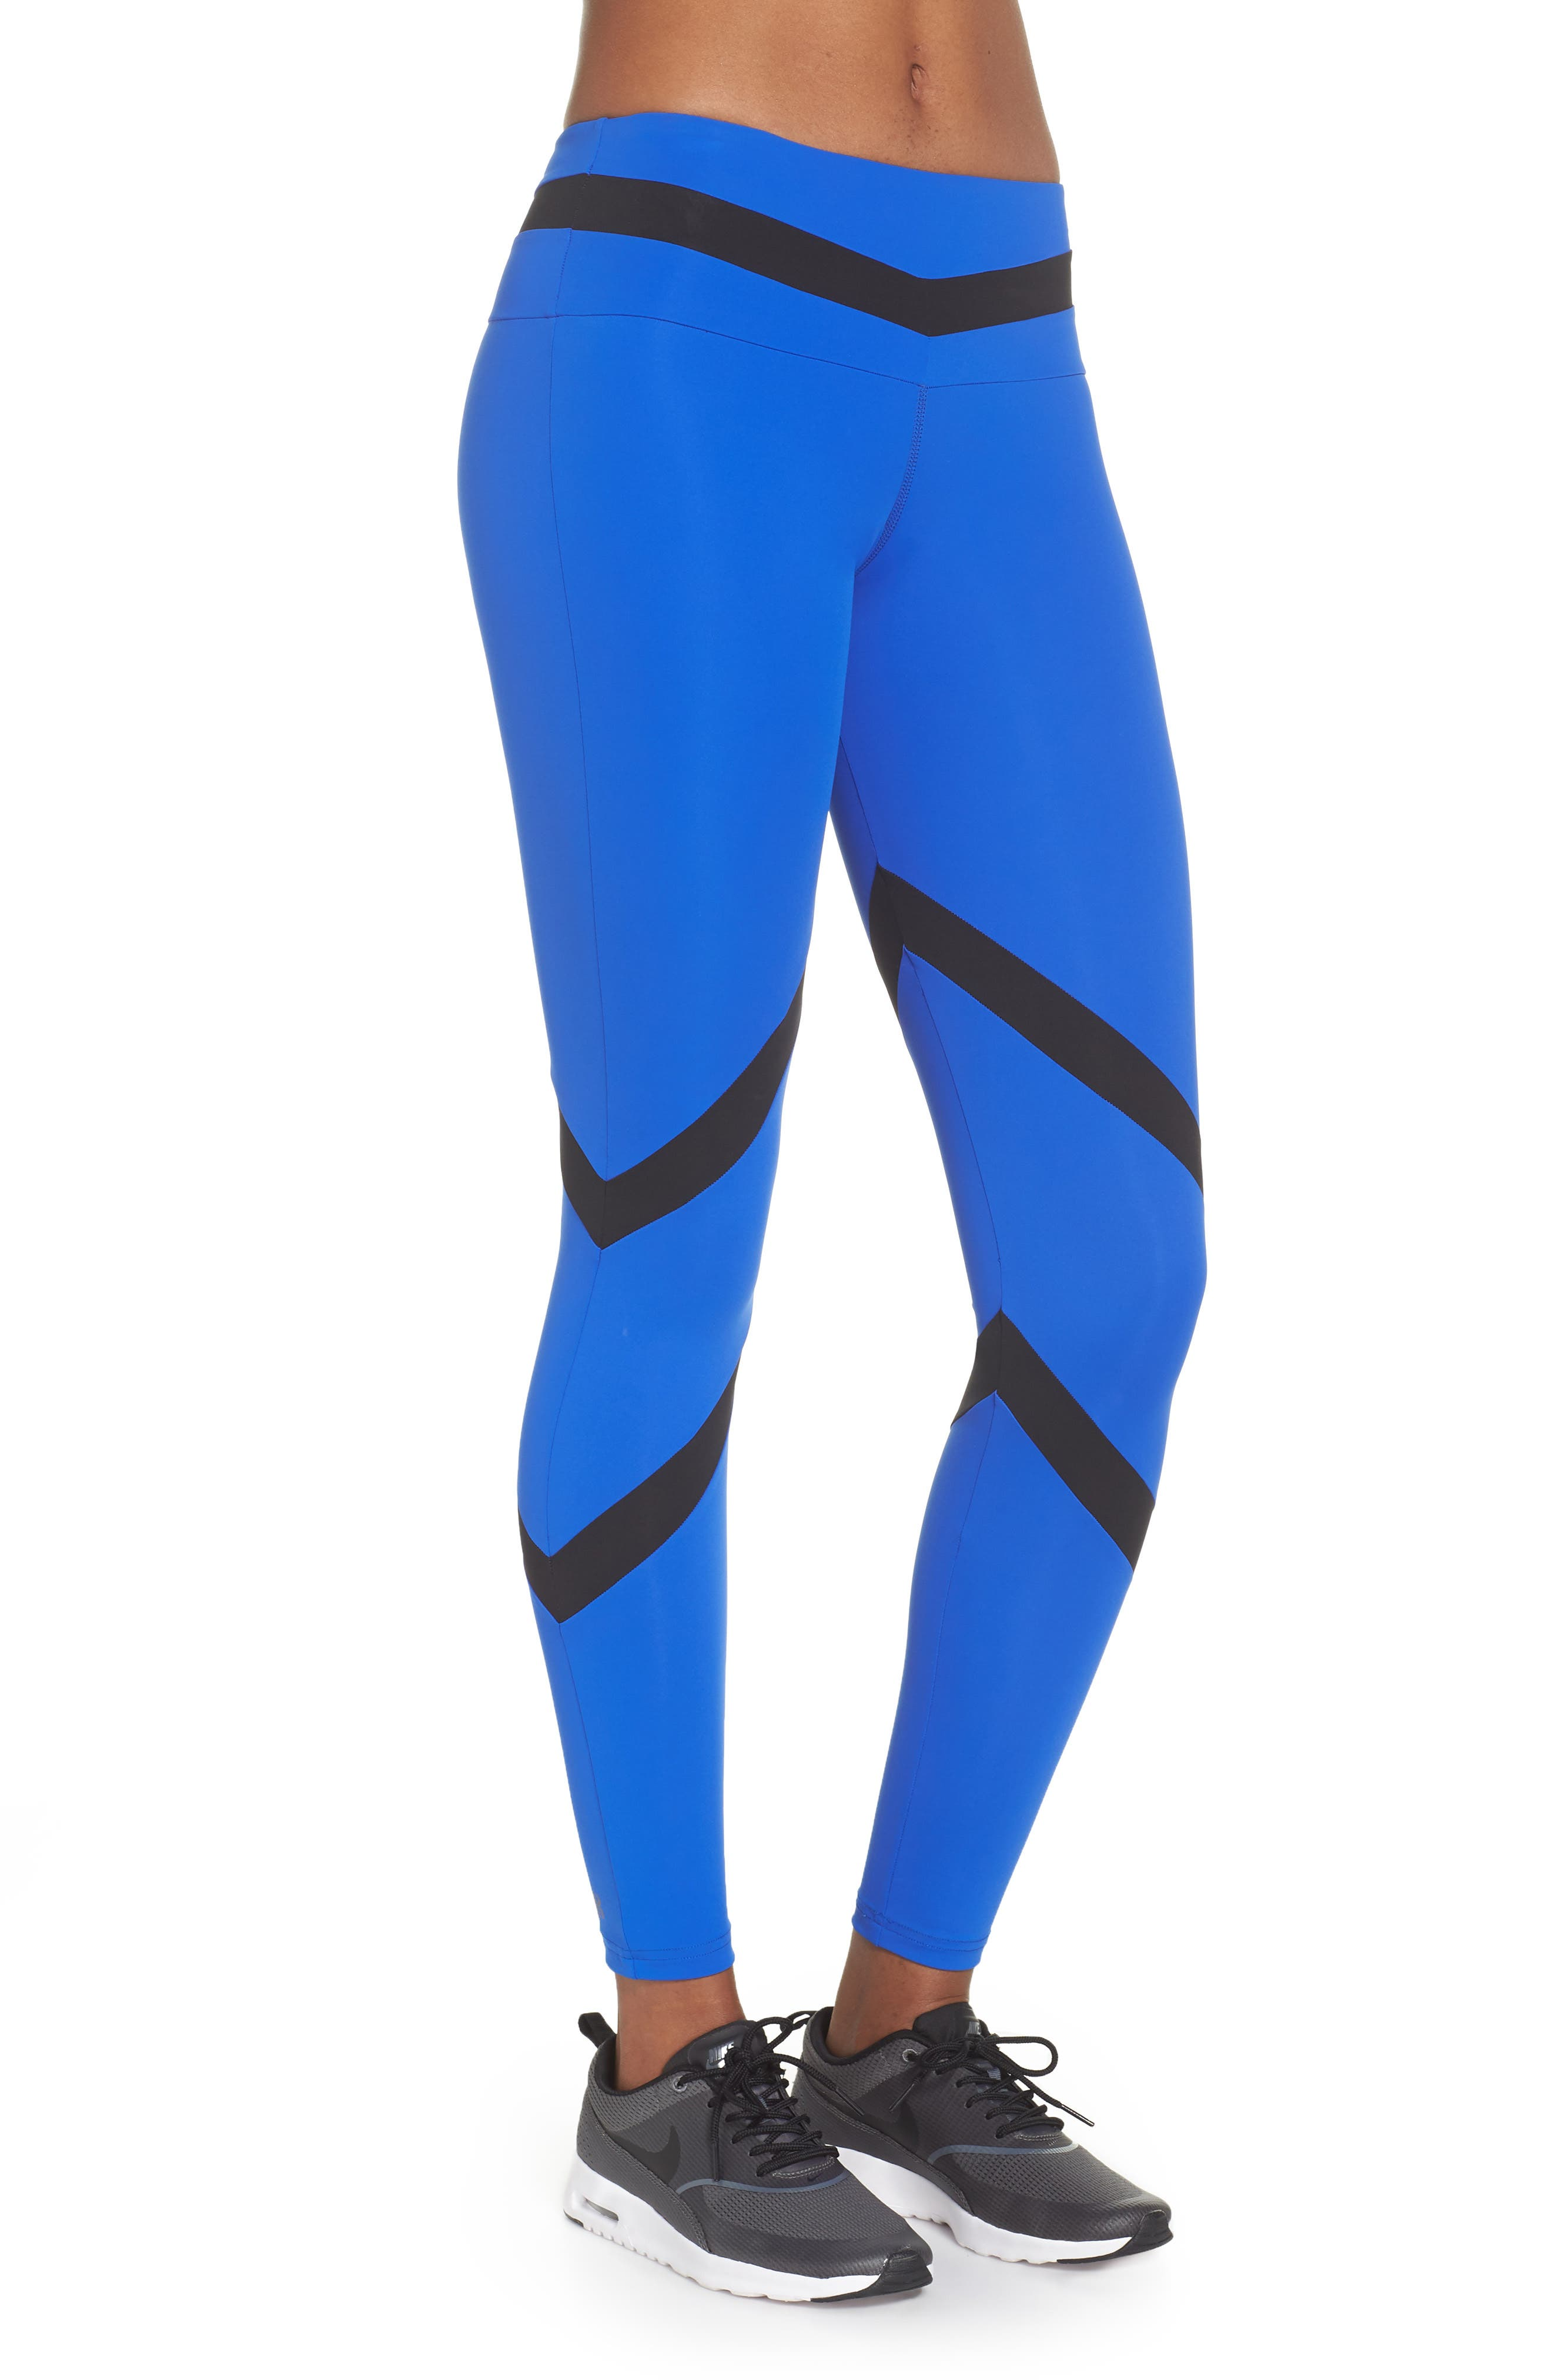 BoomBoom Athletica Tricolor Leggings,                             Alternate thumbnail 3, color,                             Cobalt Blue/ Black